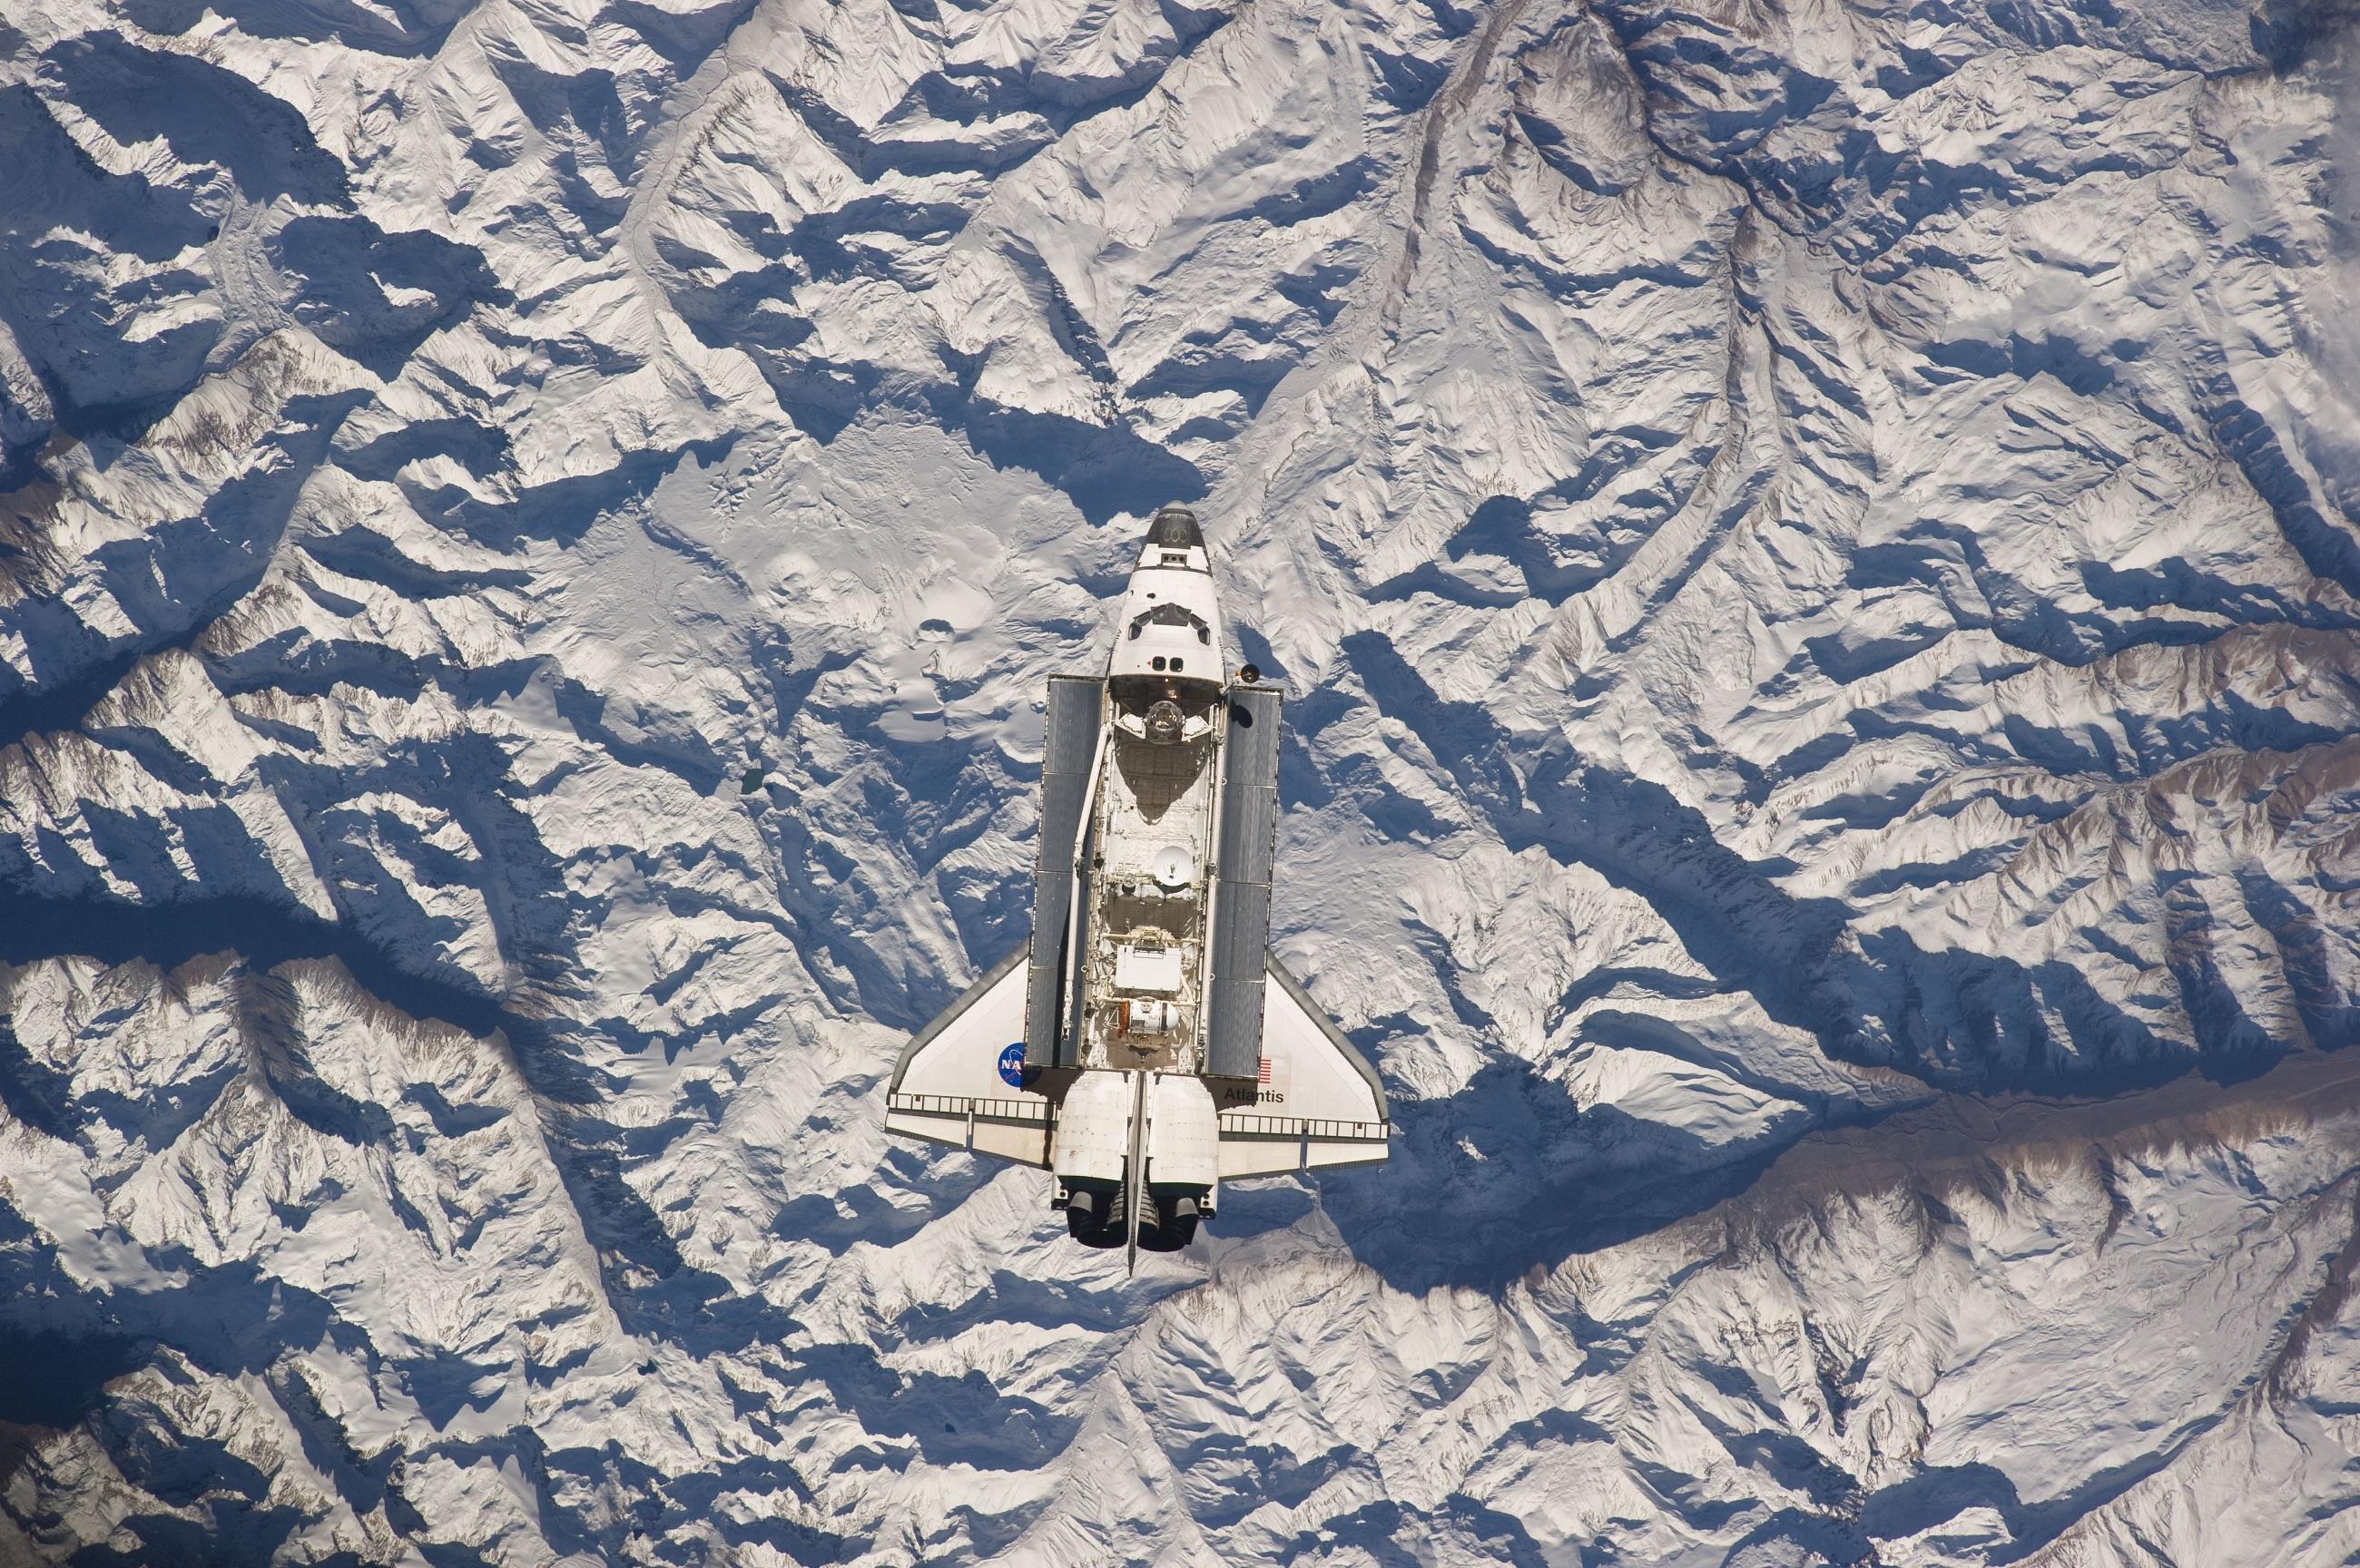 Atlantis space shuttle photo